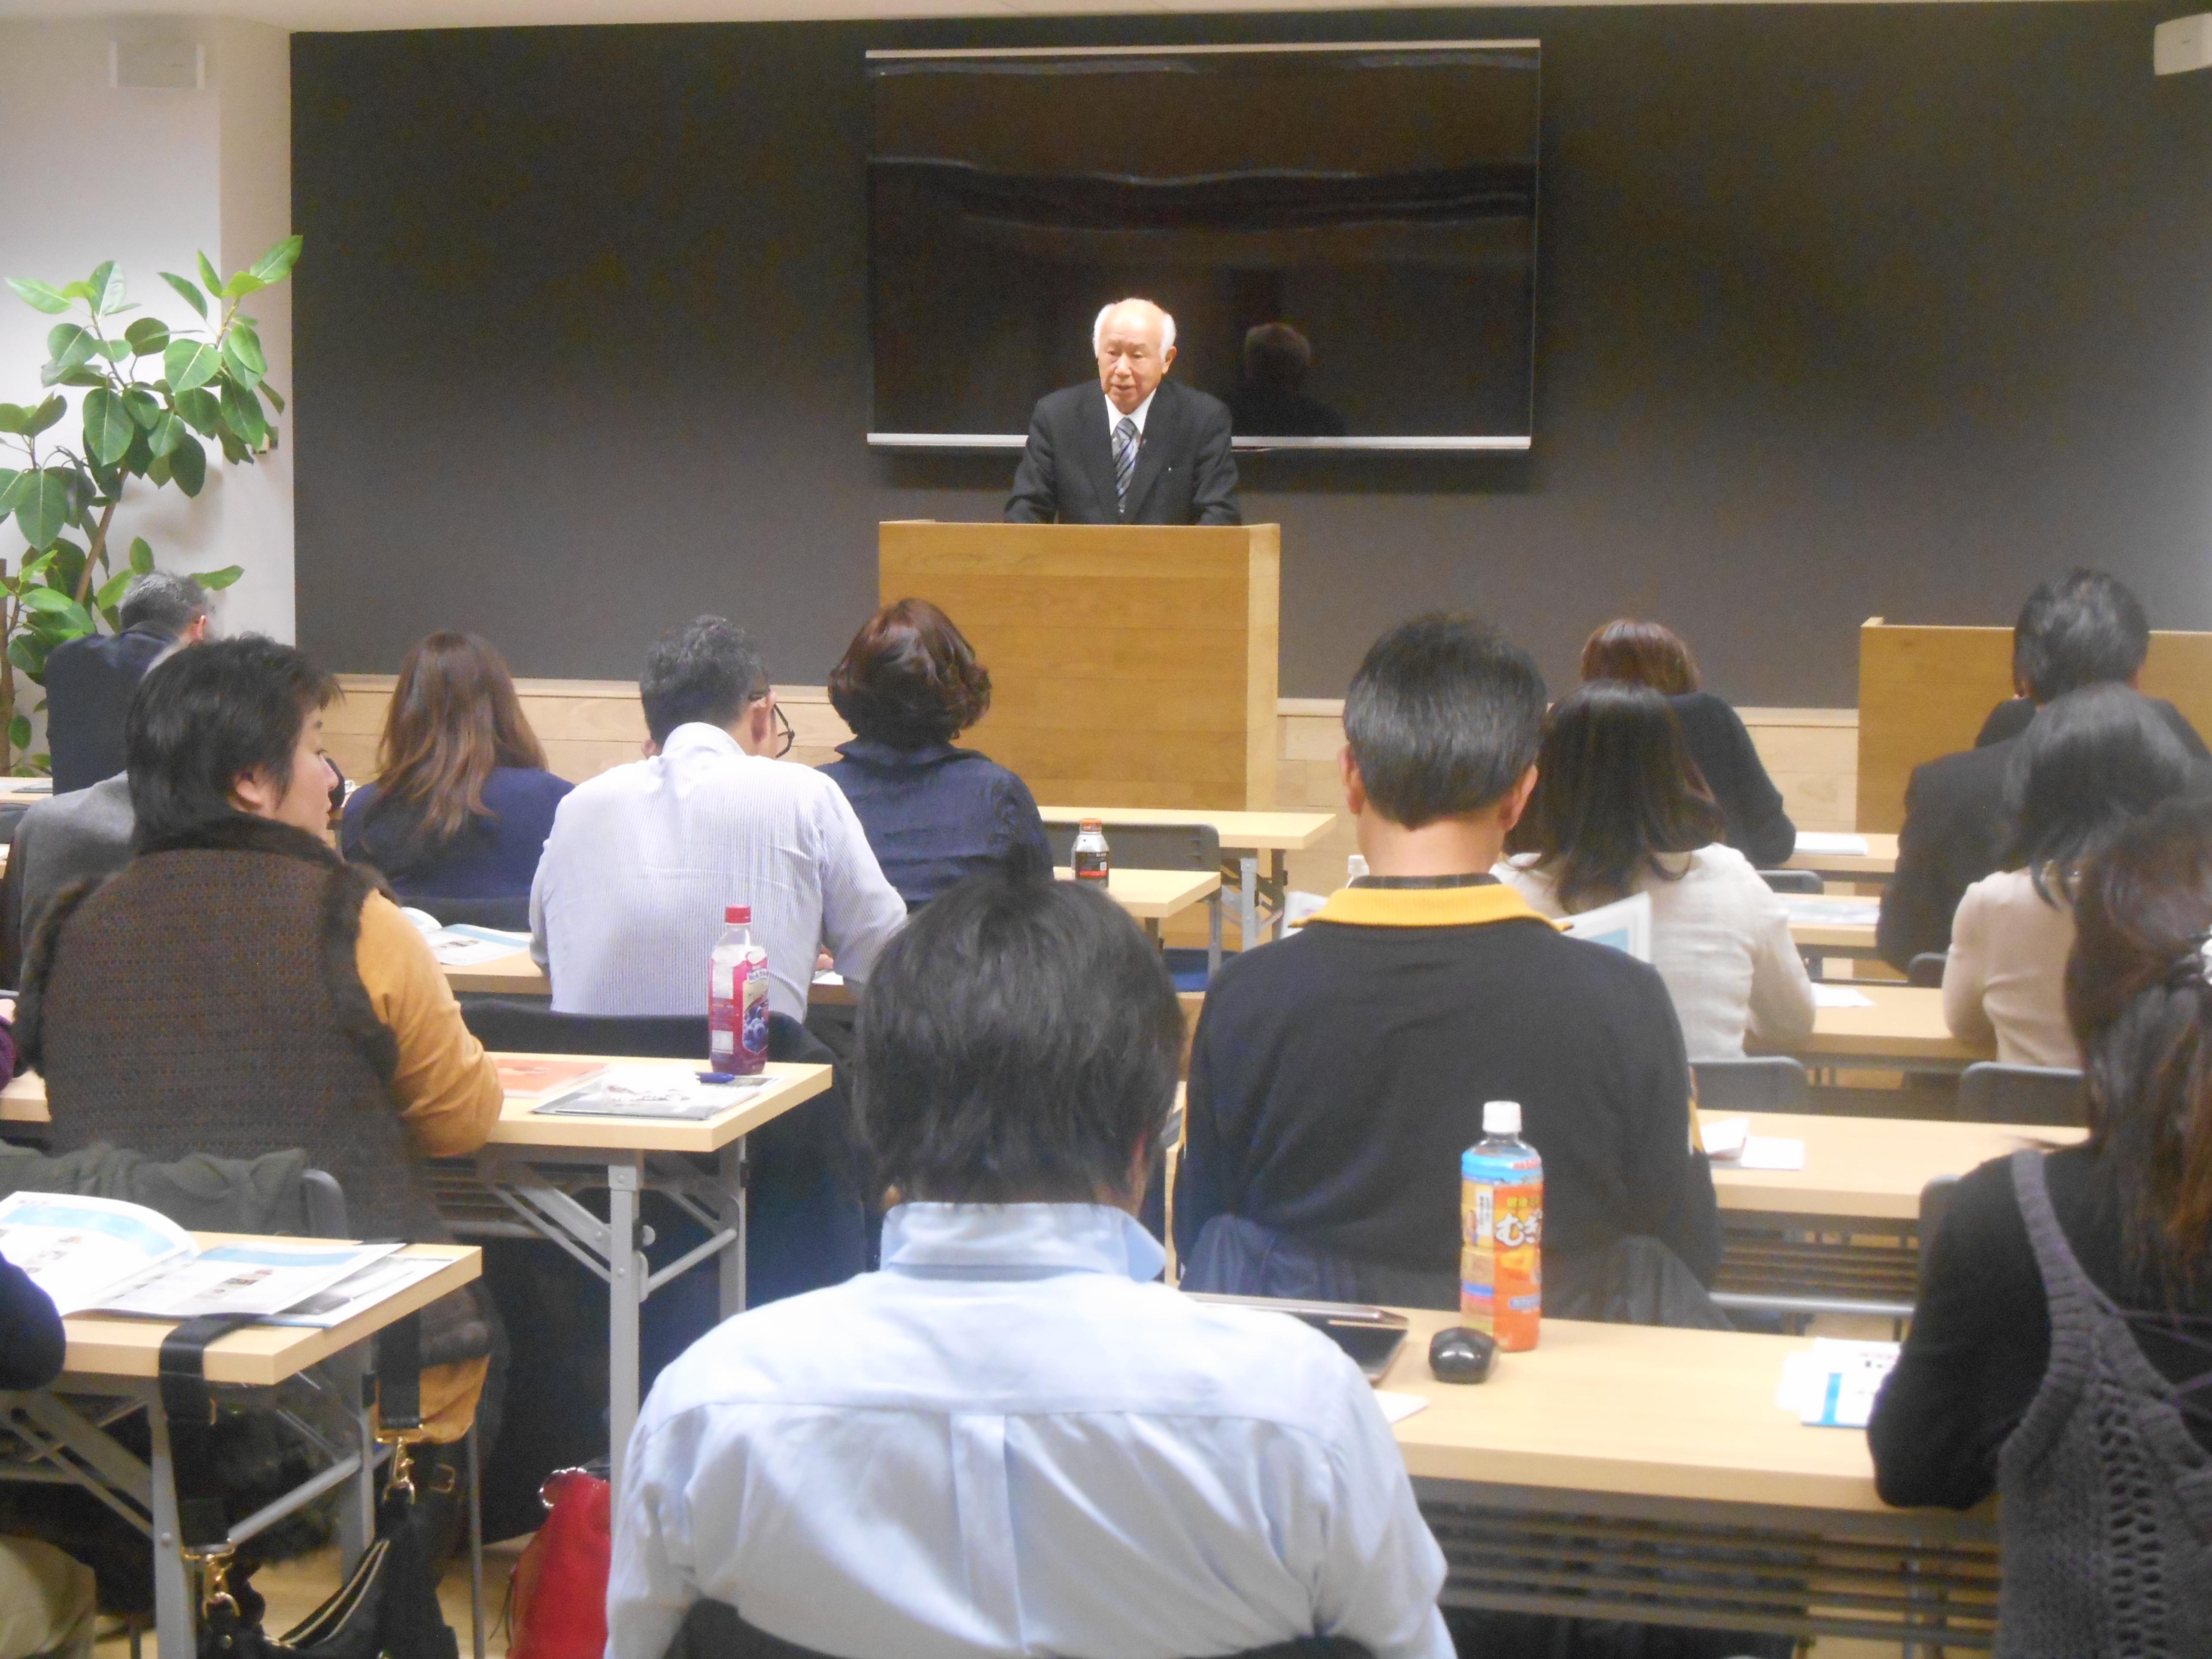 DSCN0450 - 4月1日東京思風塾の開催になります。